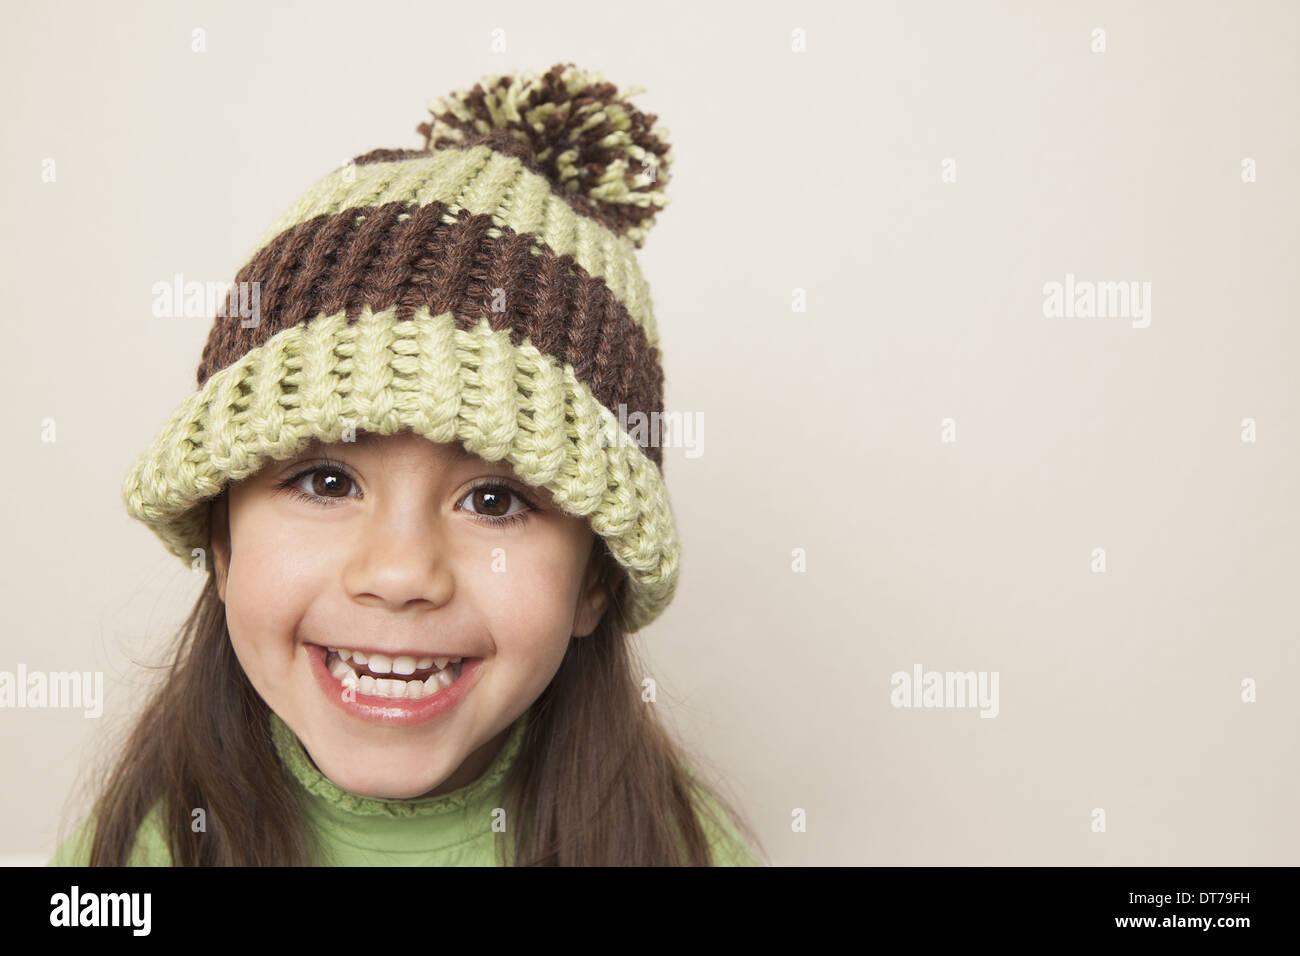 Turkish Hat Stock Photos & Turkish Hat Stock Images - Alamy